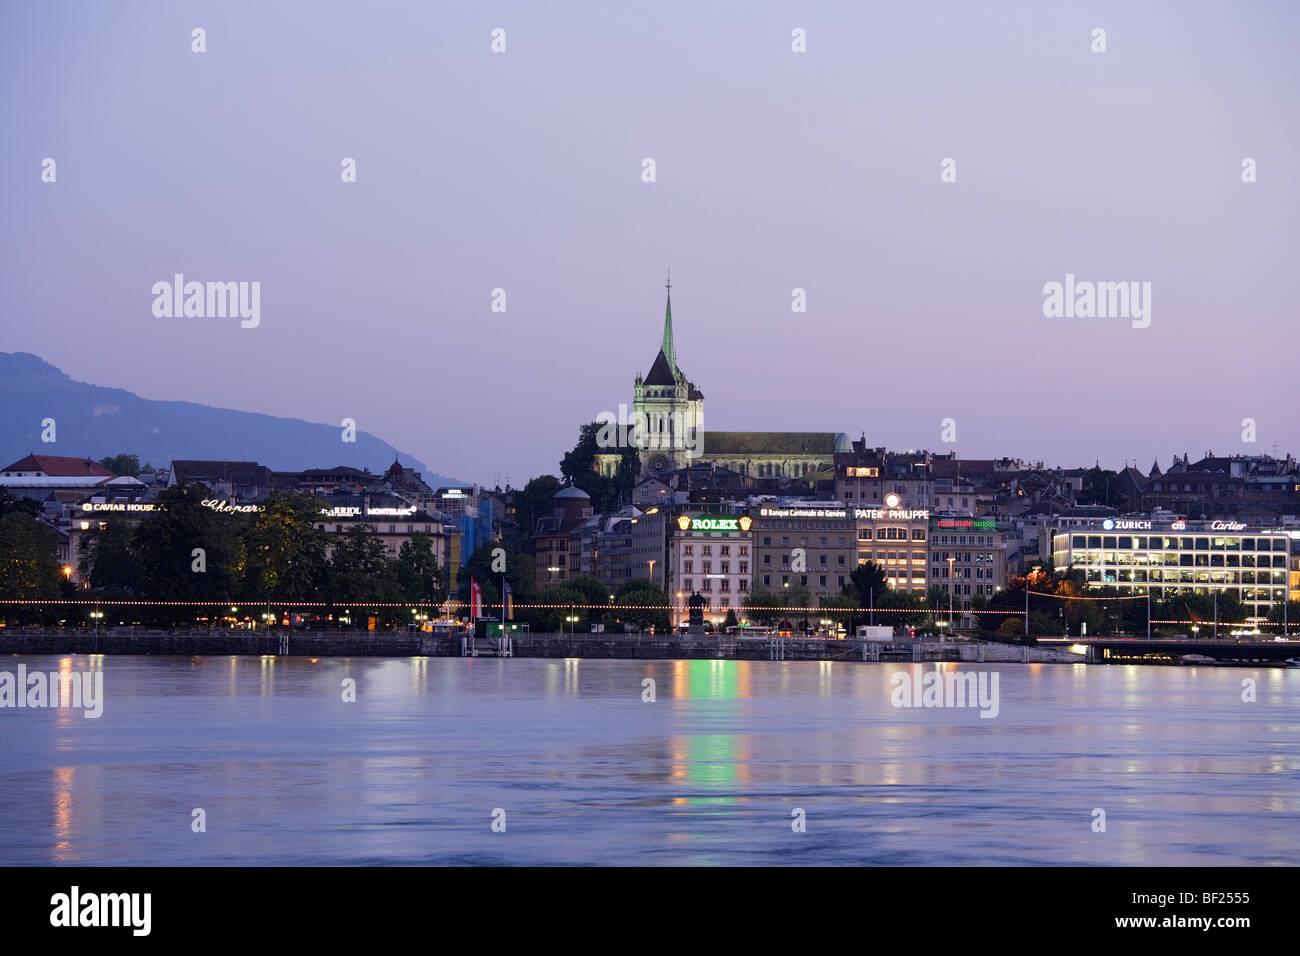 St. Pierre Cathedral in the evening, Geneva, Canton of Geneva, Switzerland - Stock Image